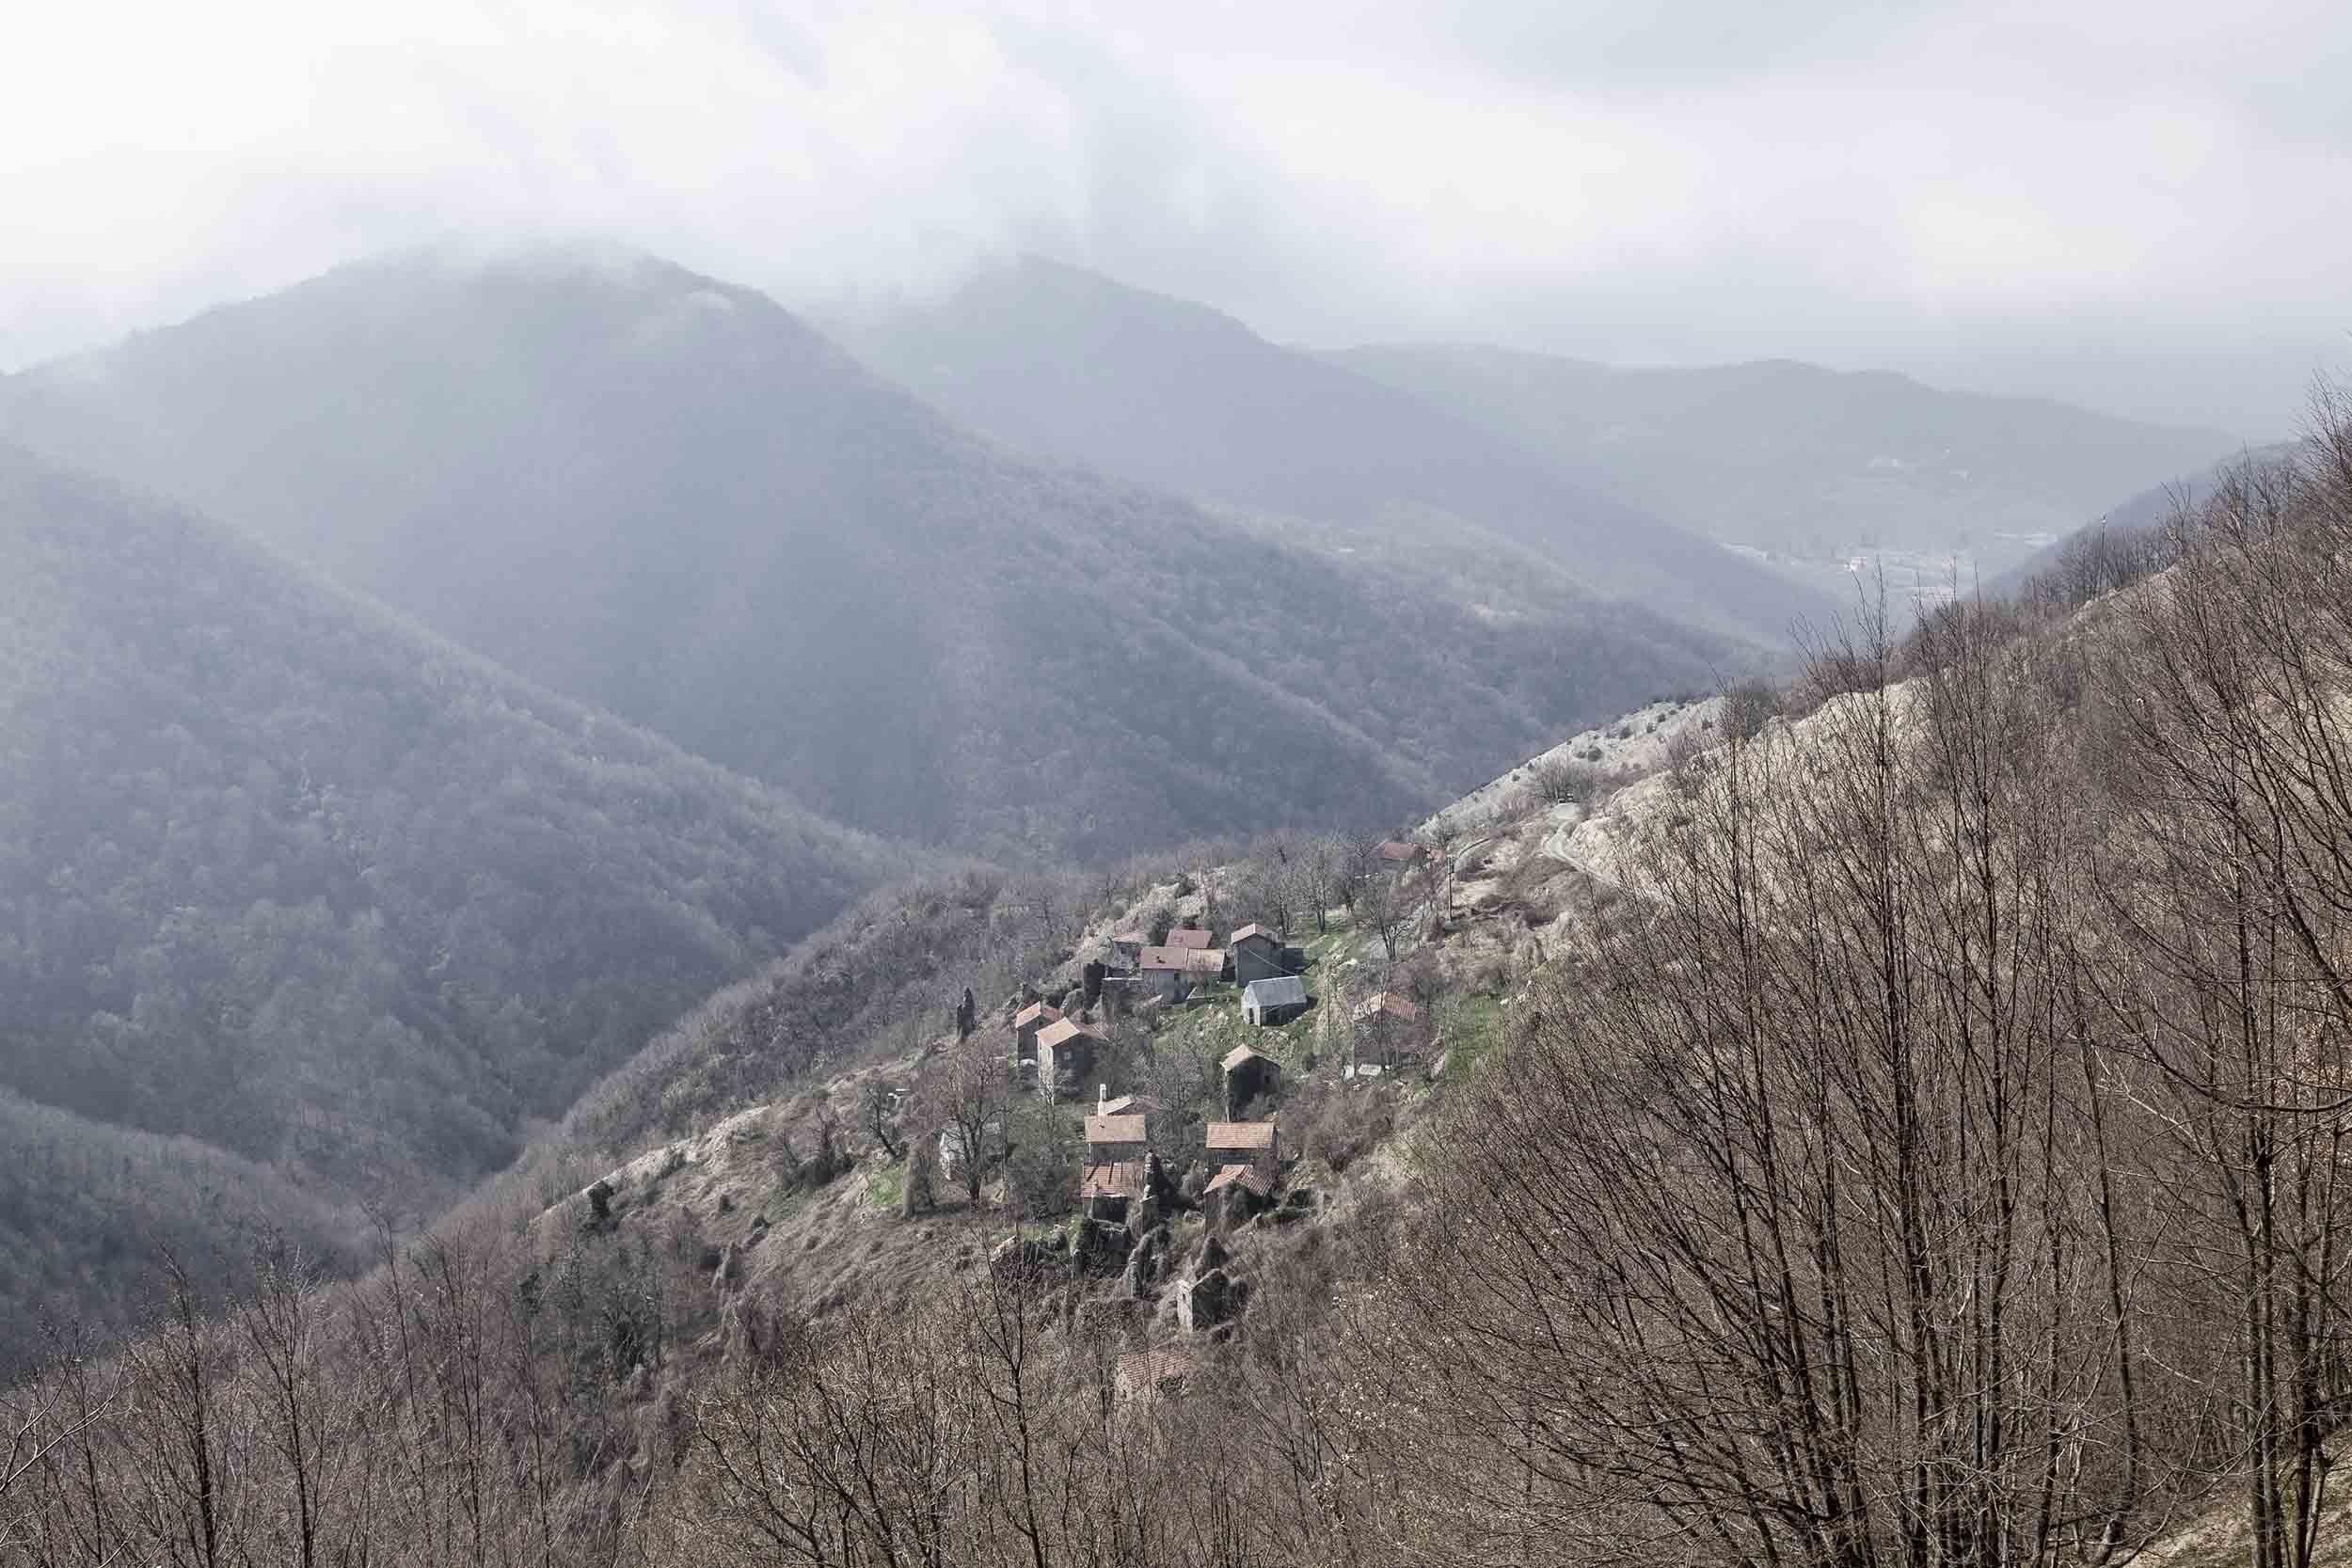 Abandoned landscapes north of Genova, Italy. Image: Luca Casonato